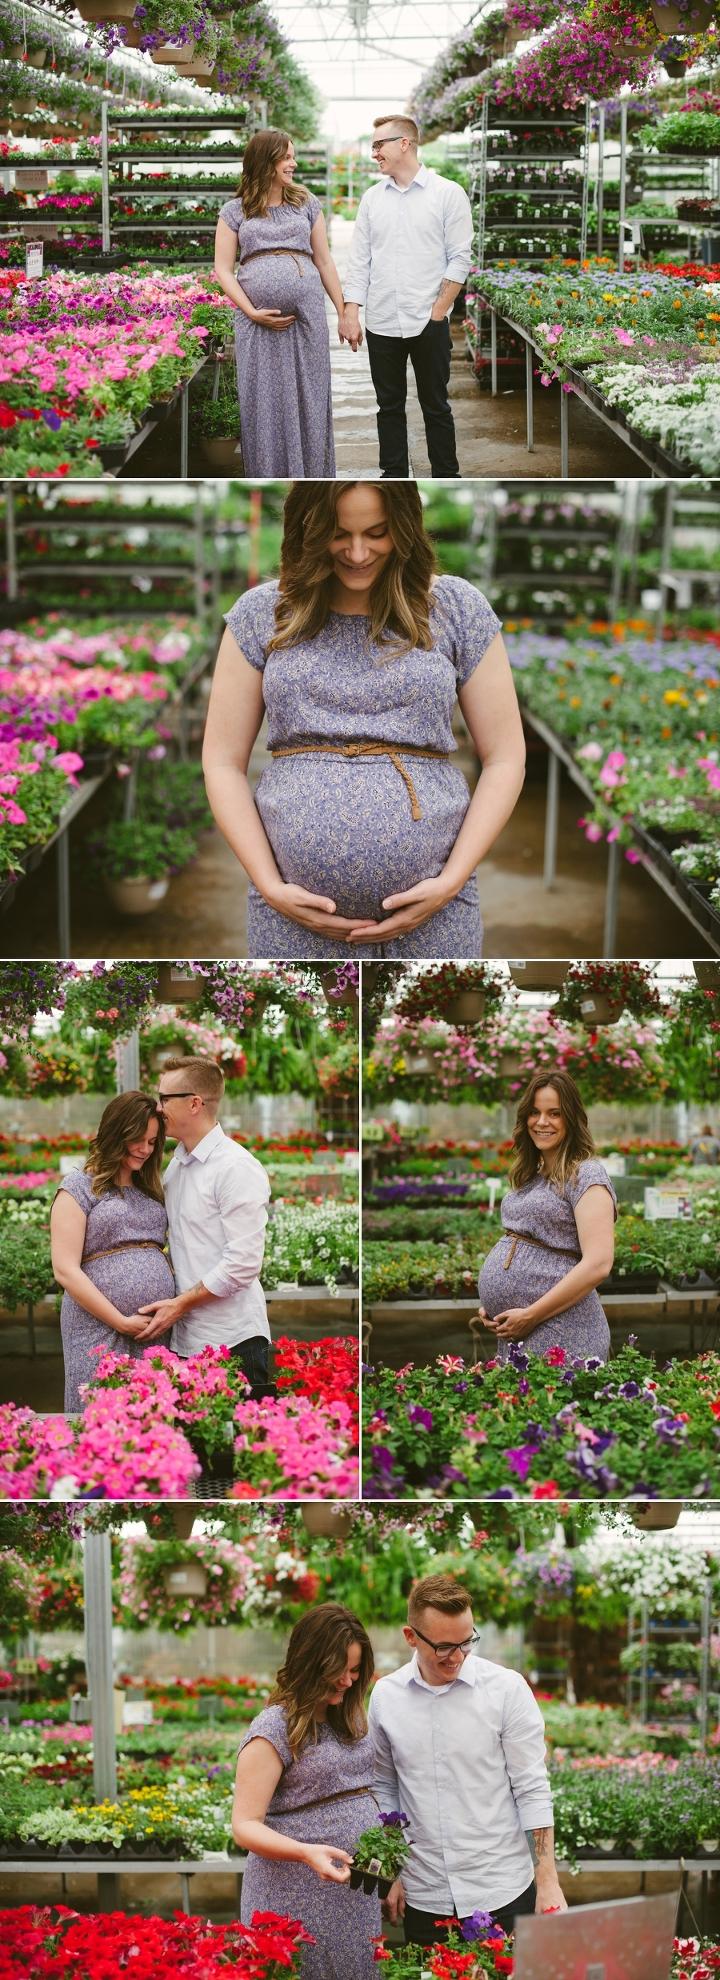 Josh Val Maternity 2